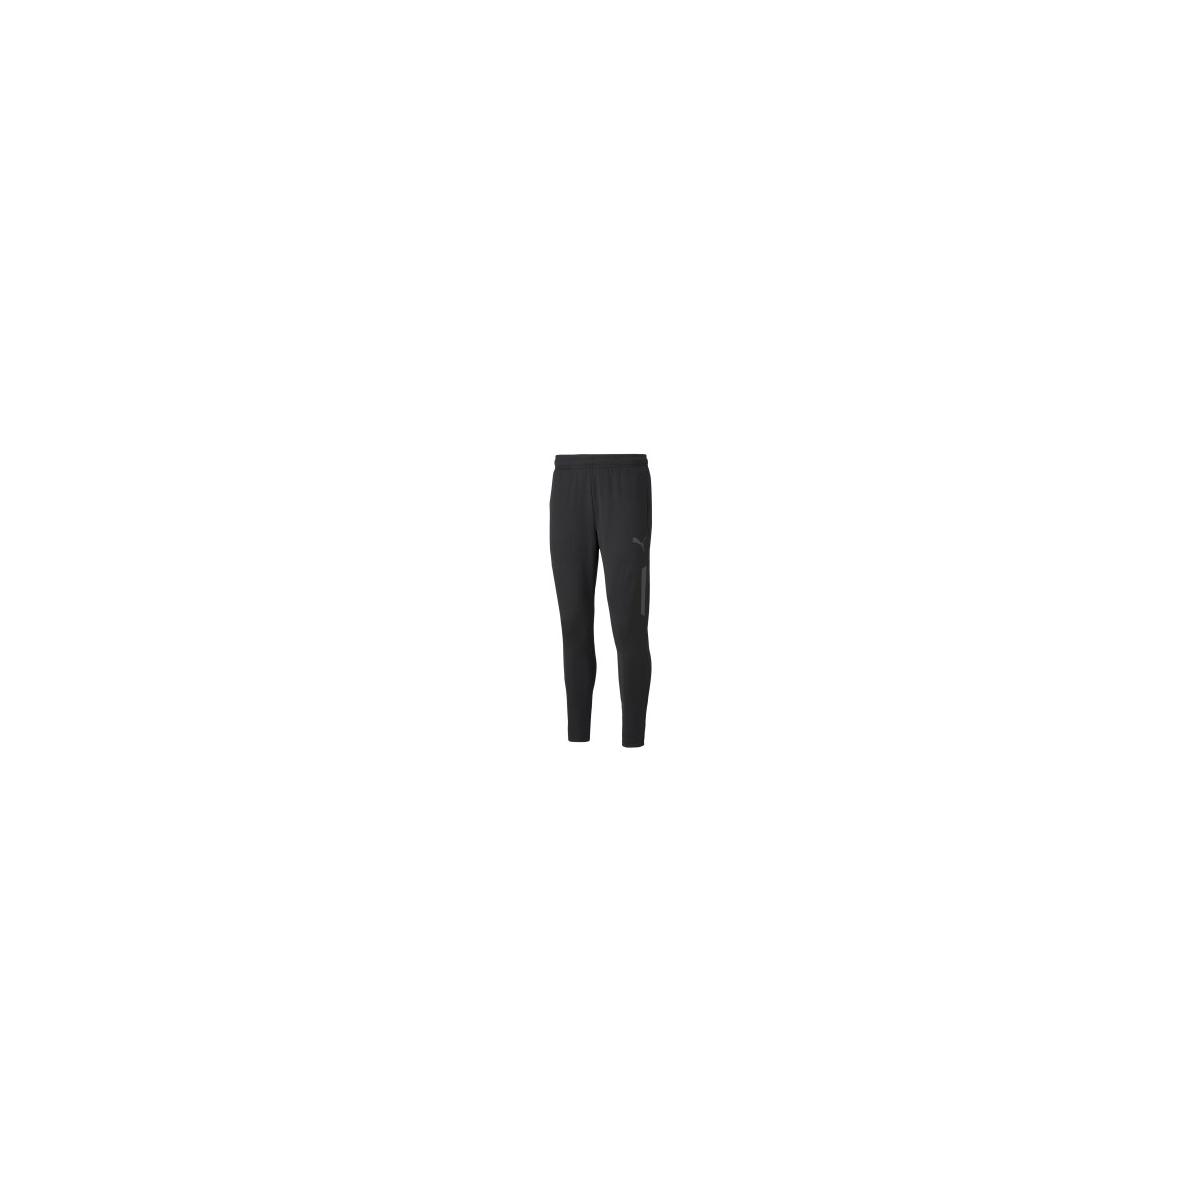 Individualliga Warm Erkek Siyah Eşofman Altı (657657-03)